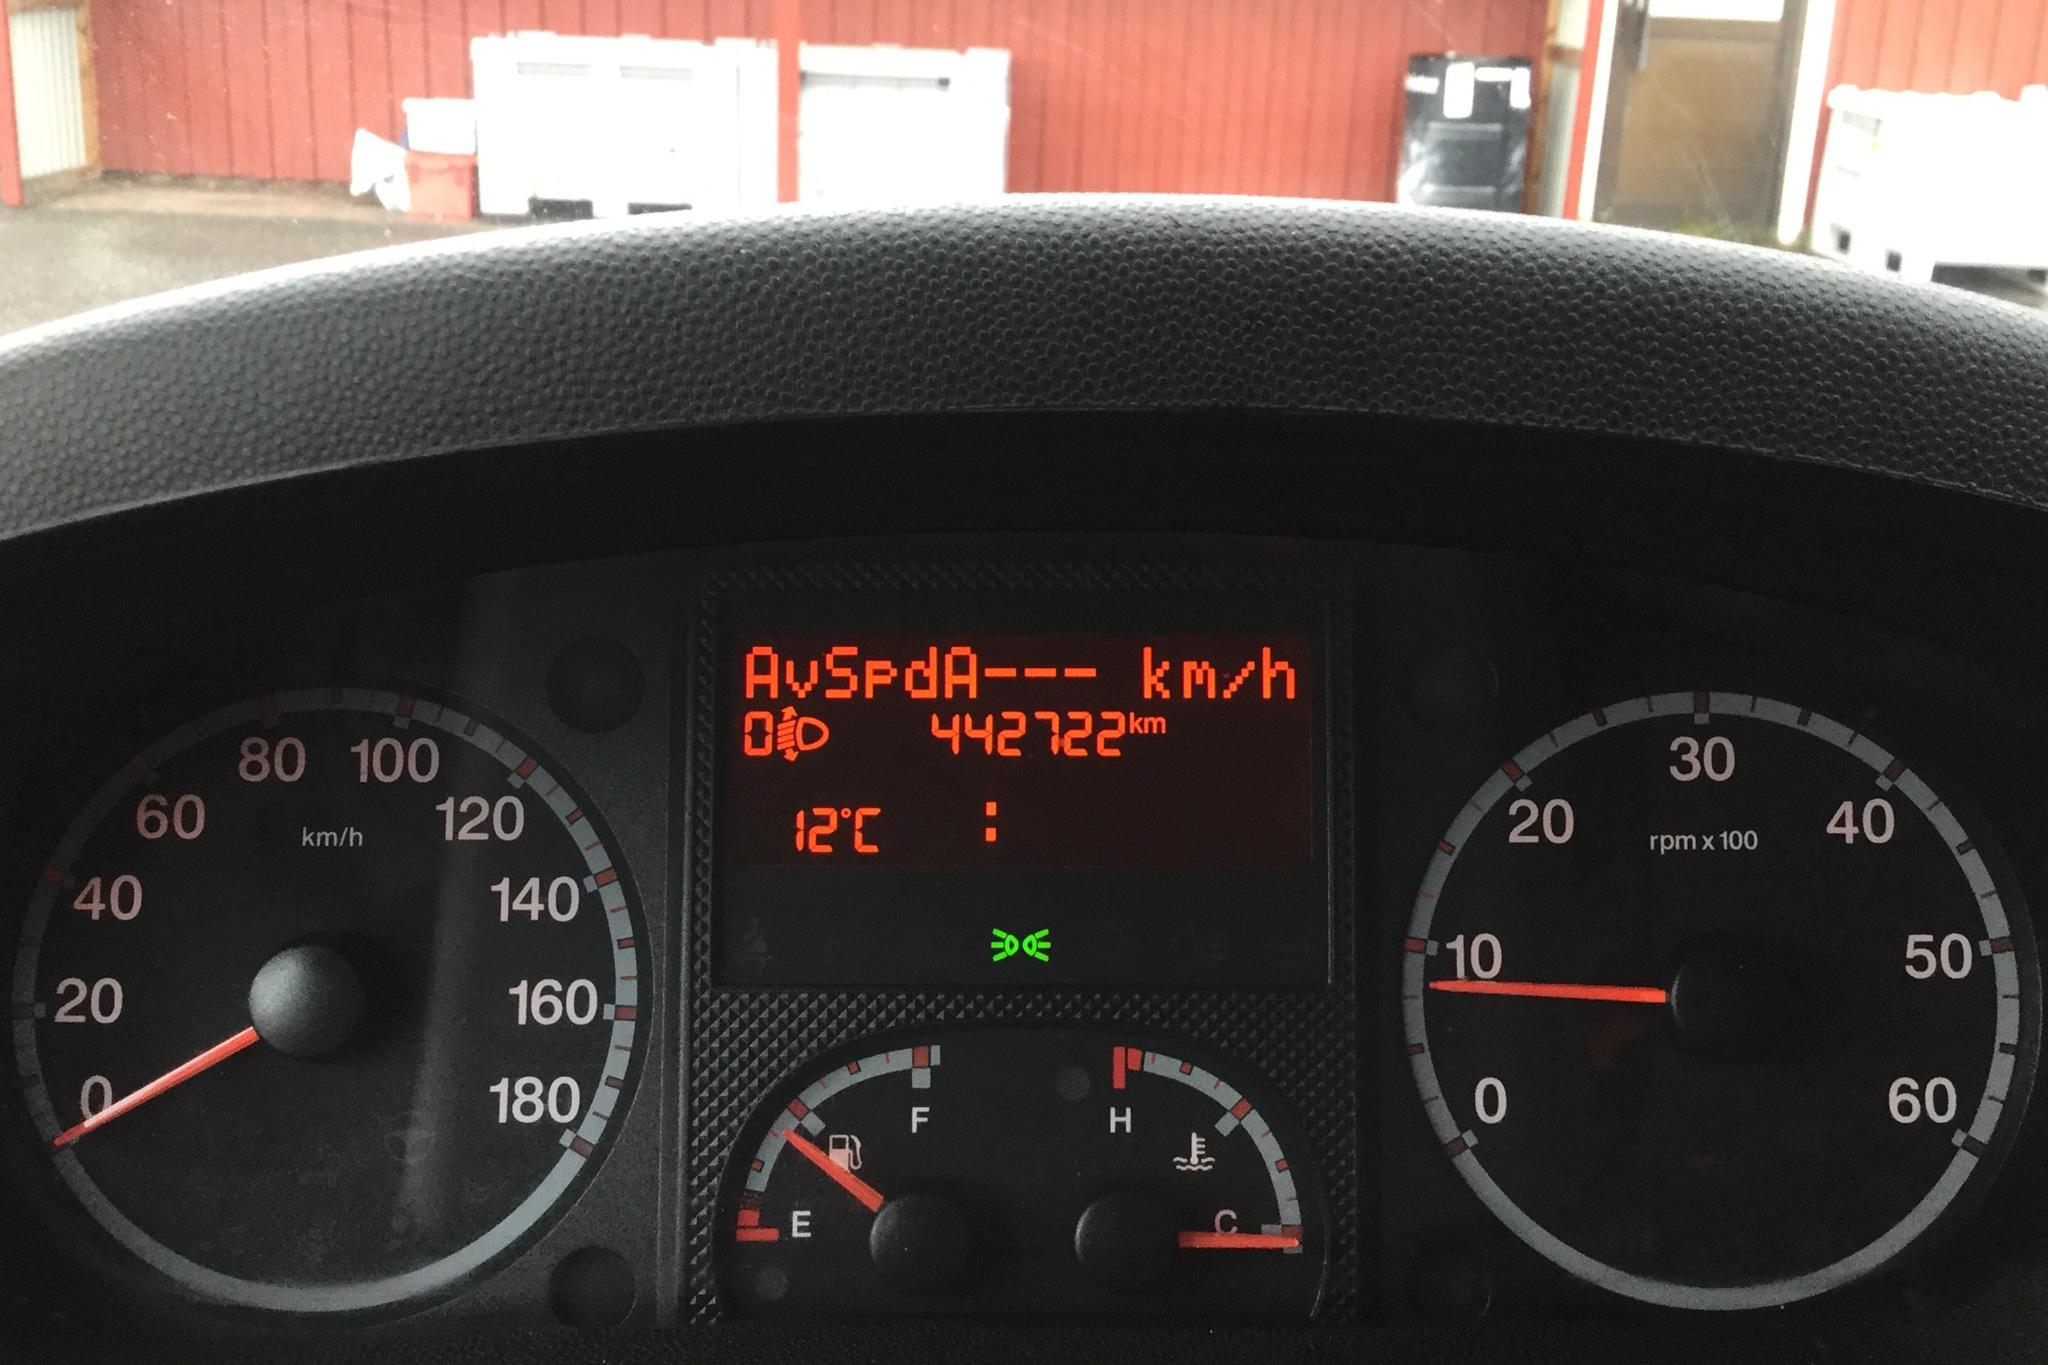 Fiat Ducato 2.3 Multijet Chassi (148hk) - 44 272 mil - Manuell - vit - 2013